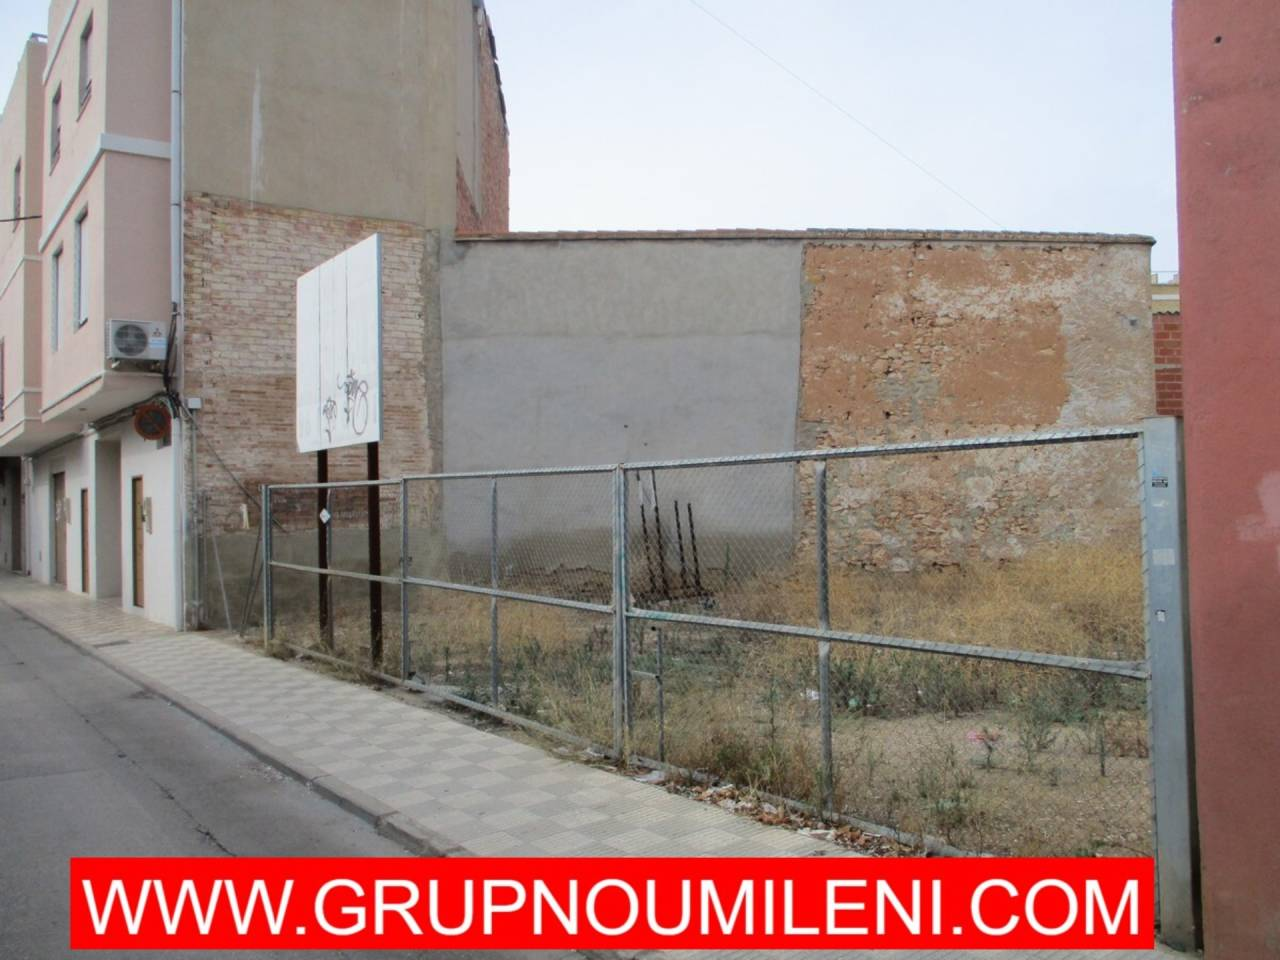 Solar urbano  Avenida papa joan xxiii. Sin comisiones   superficie total 448 m², solar superficie sol